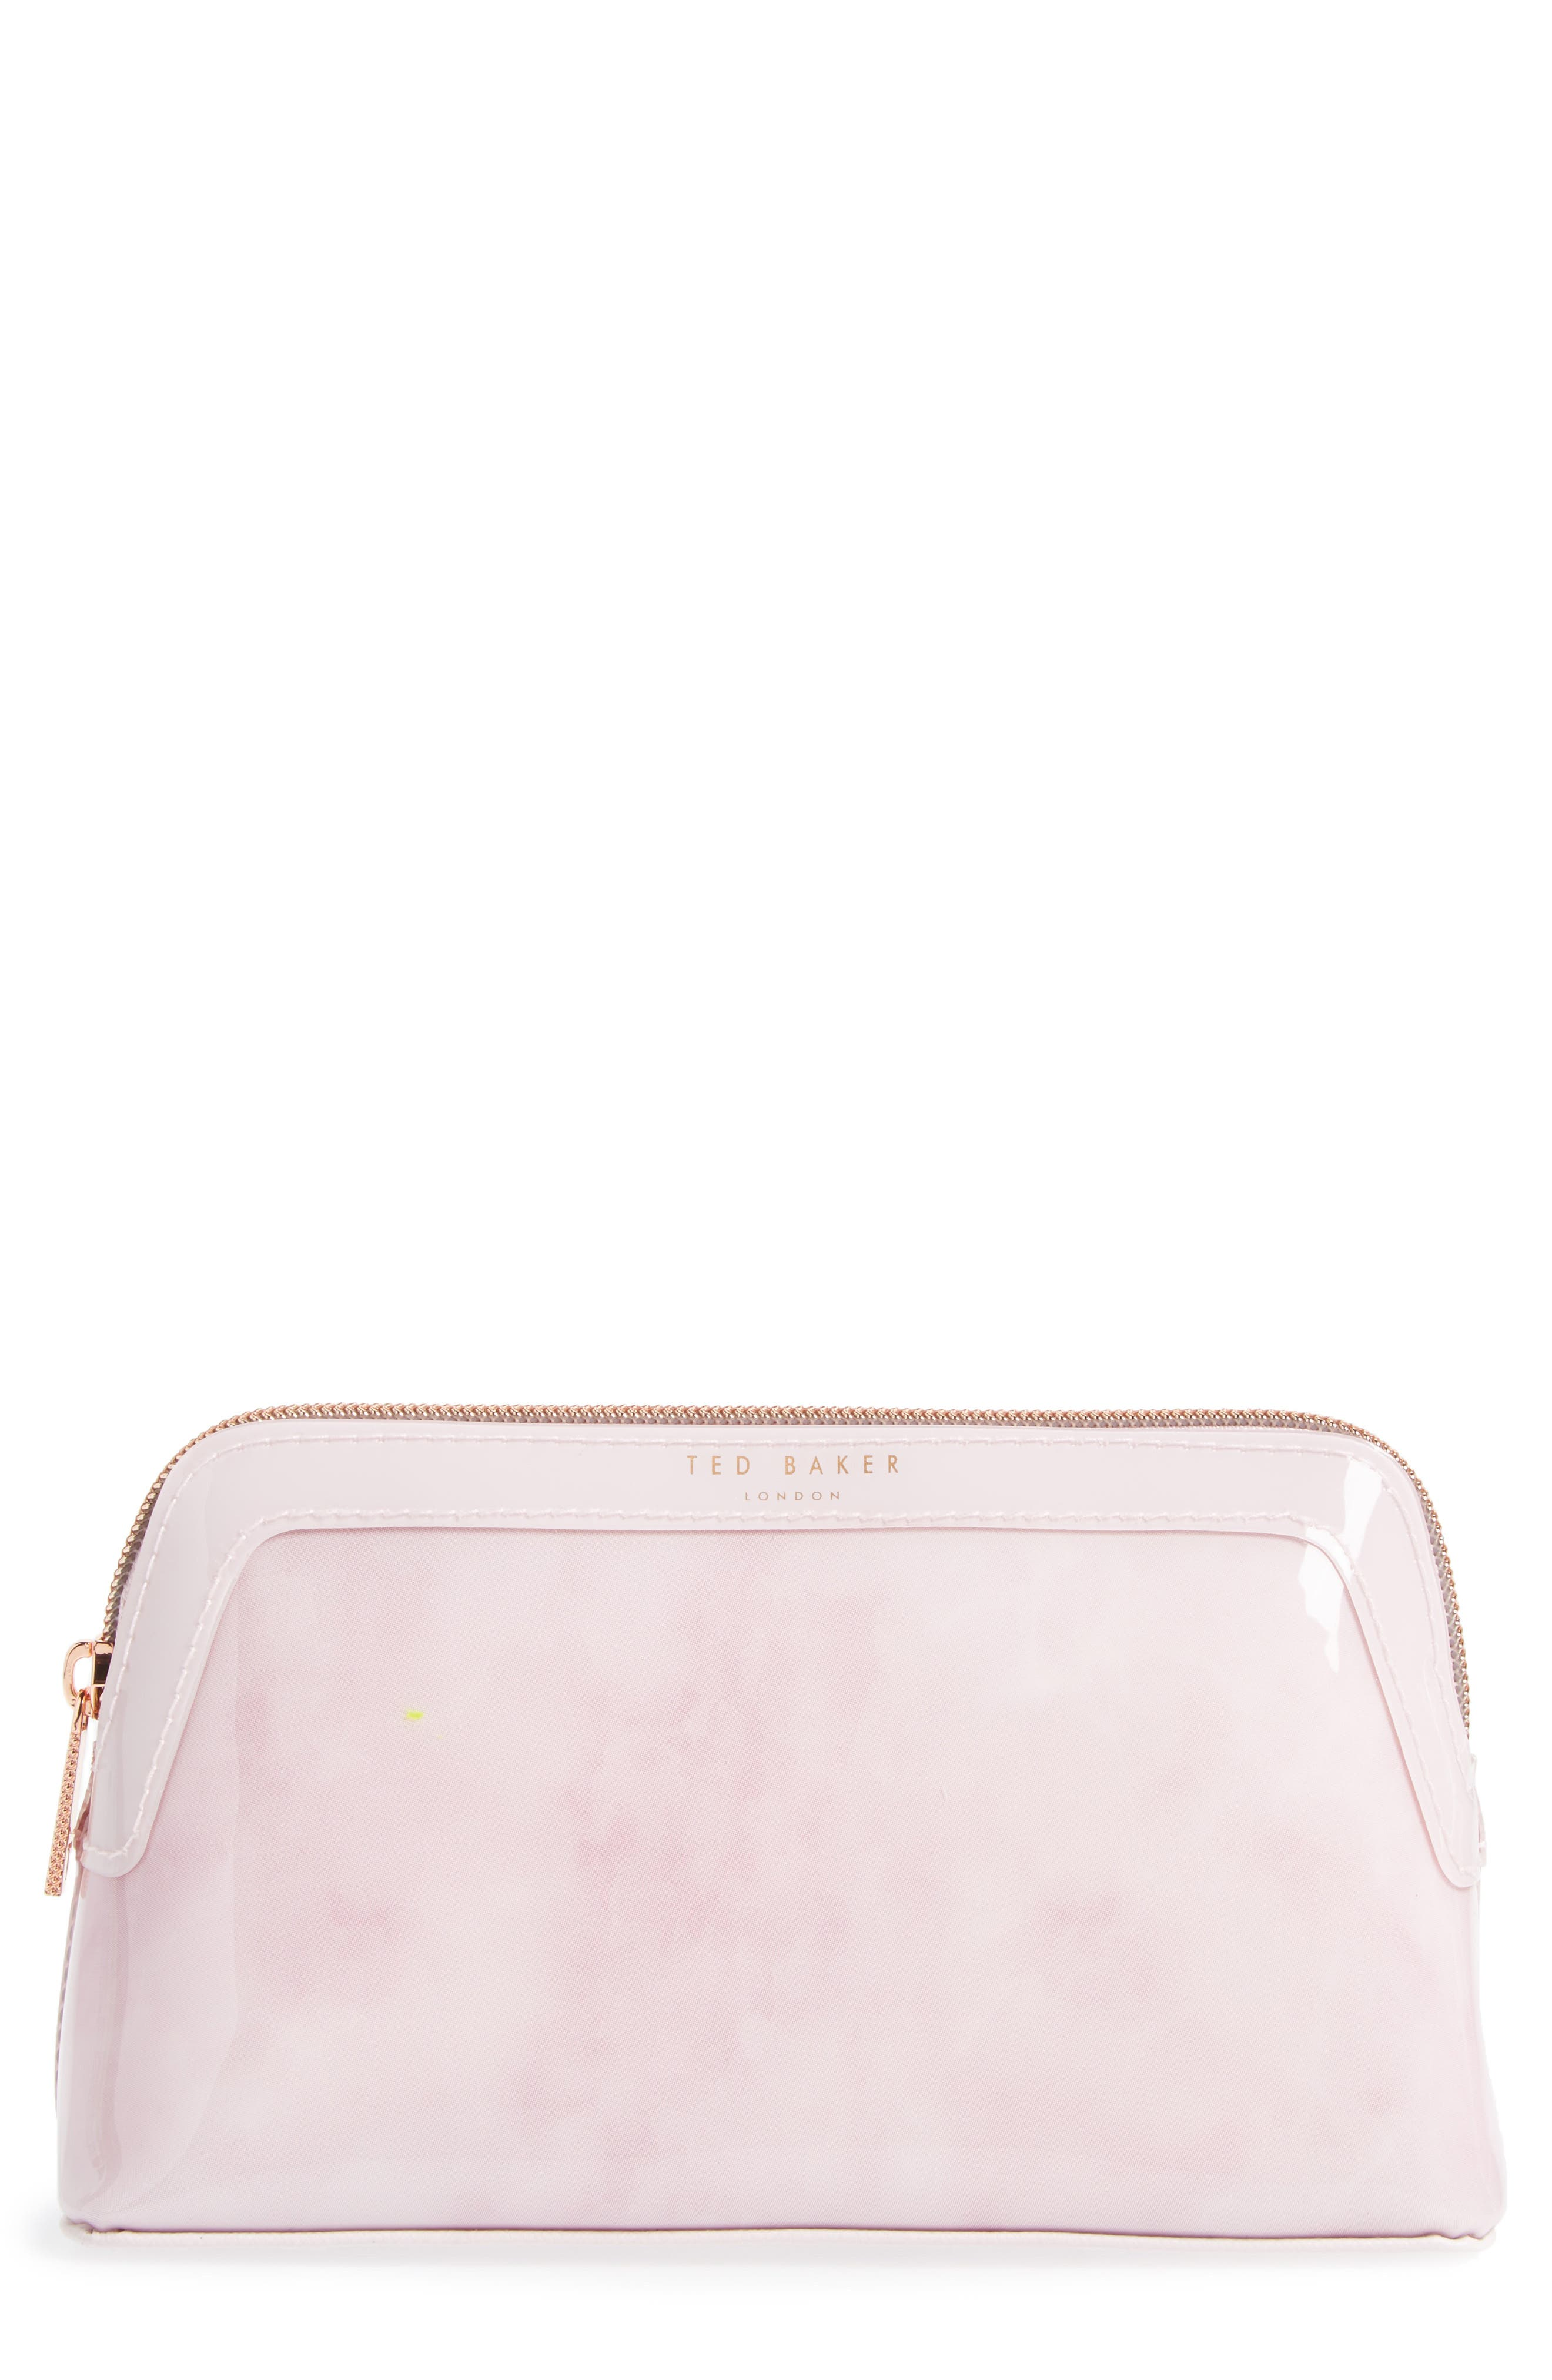 Zandra - Rose Quartz Cosmetics Bag,                             Main thumbnail 1, color,                             672